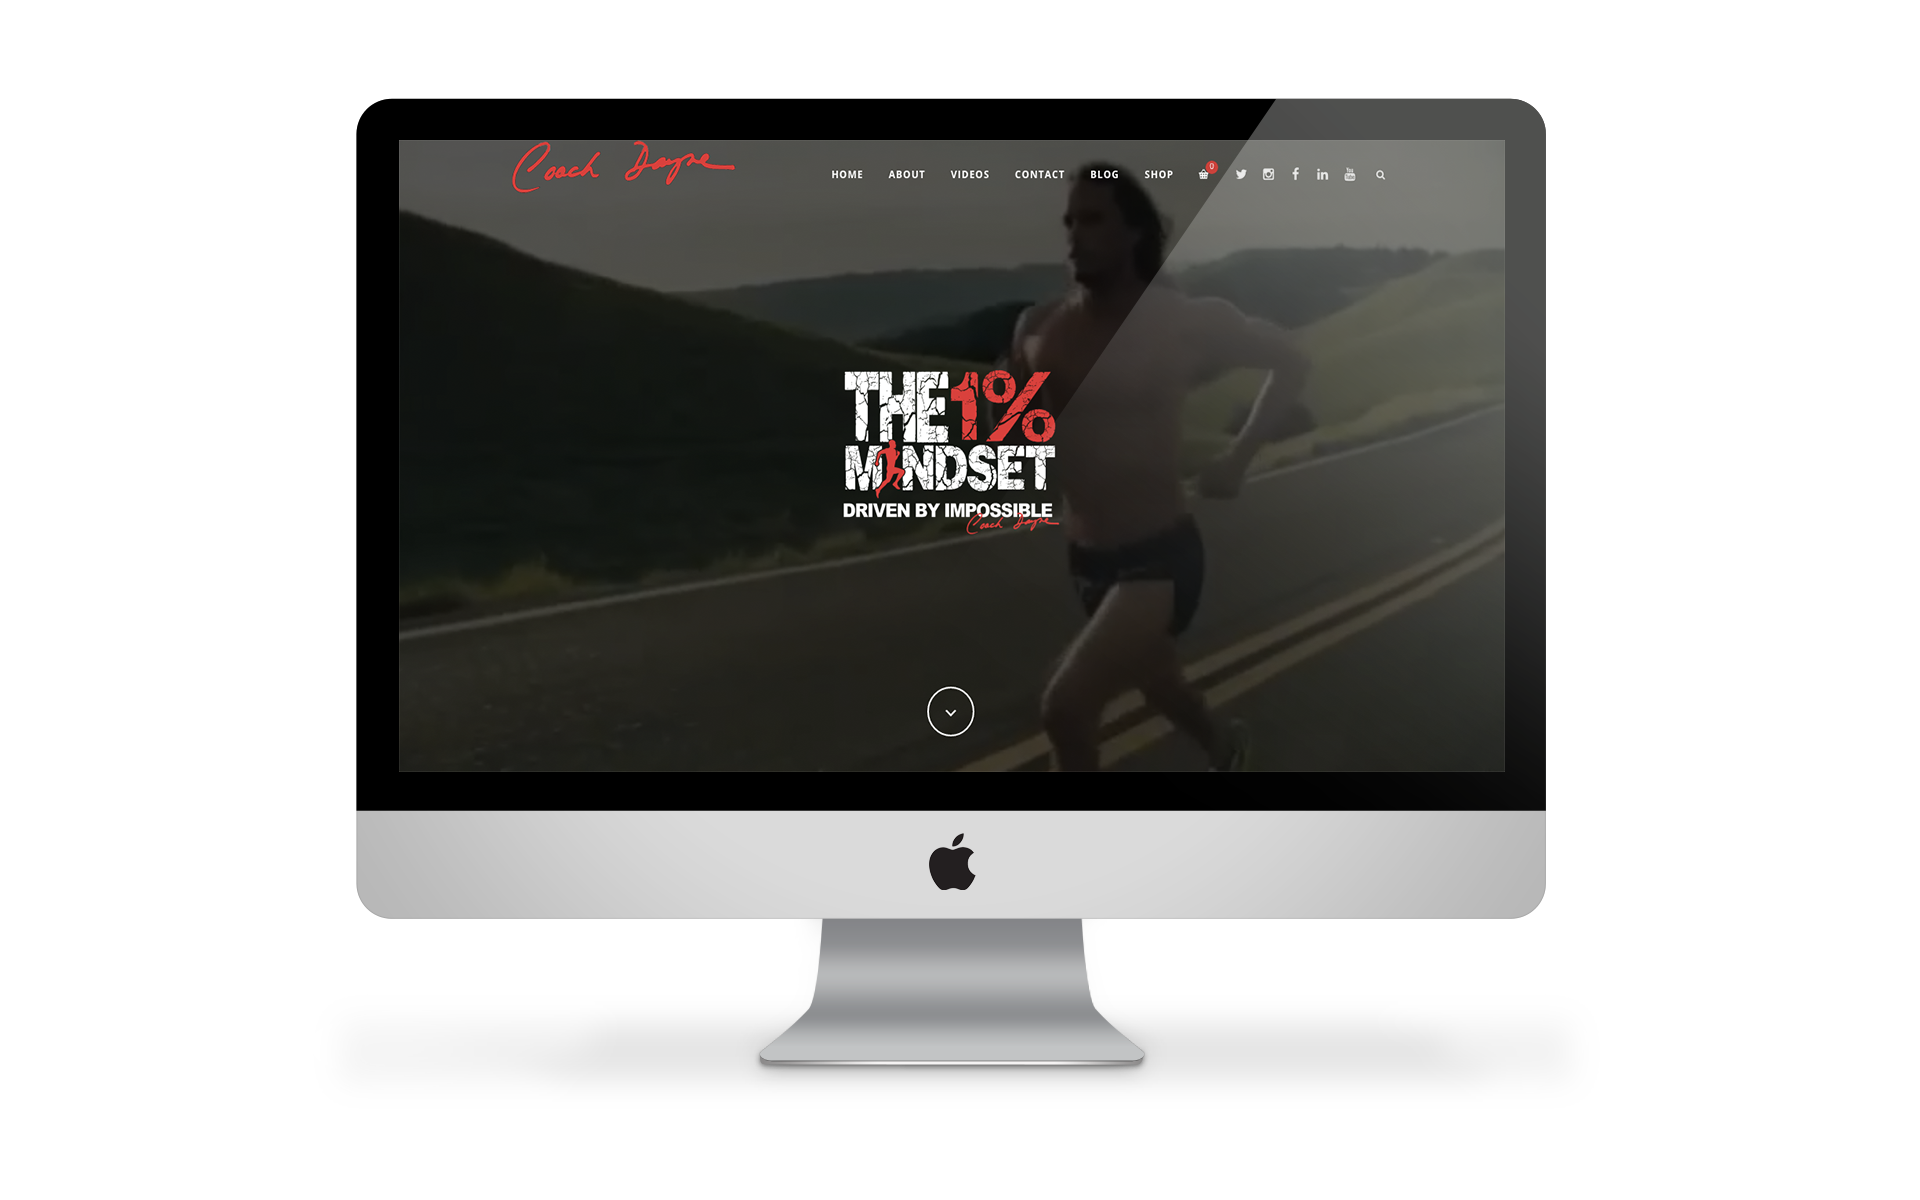 coachdayne-homepage_imac-screen.png